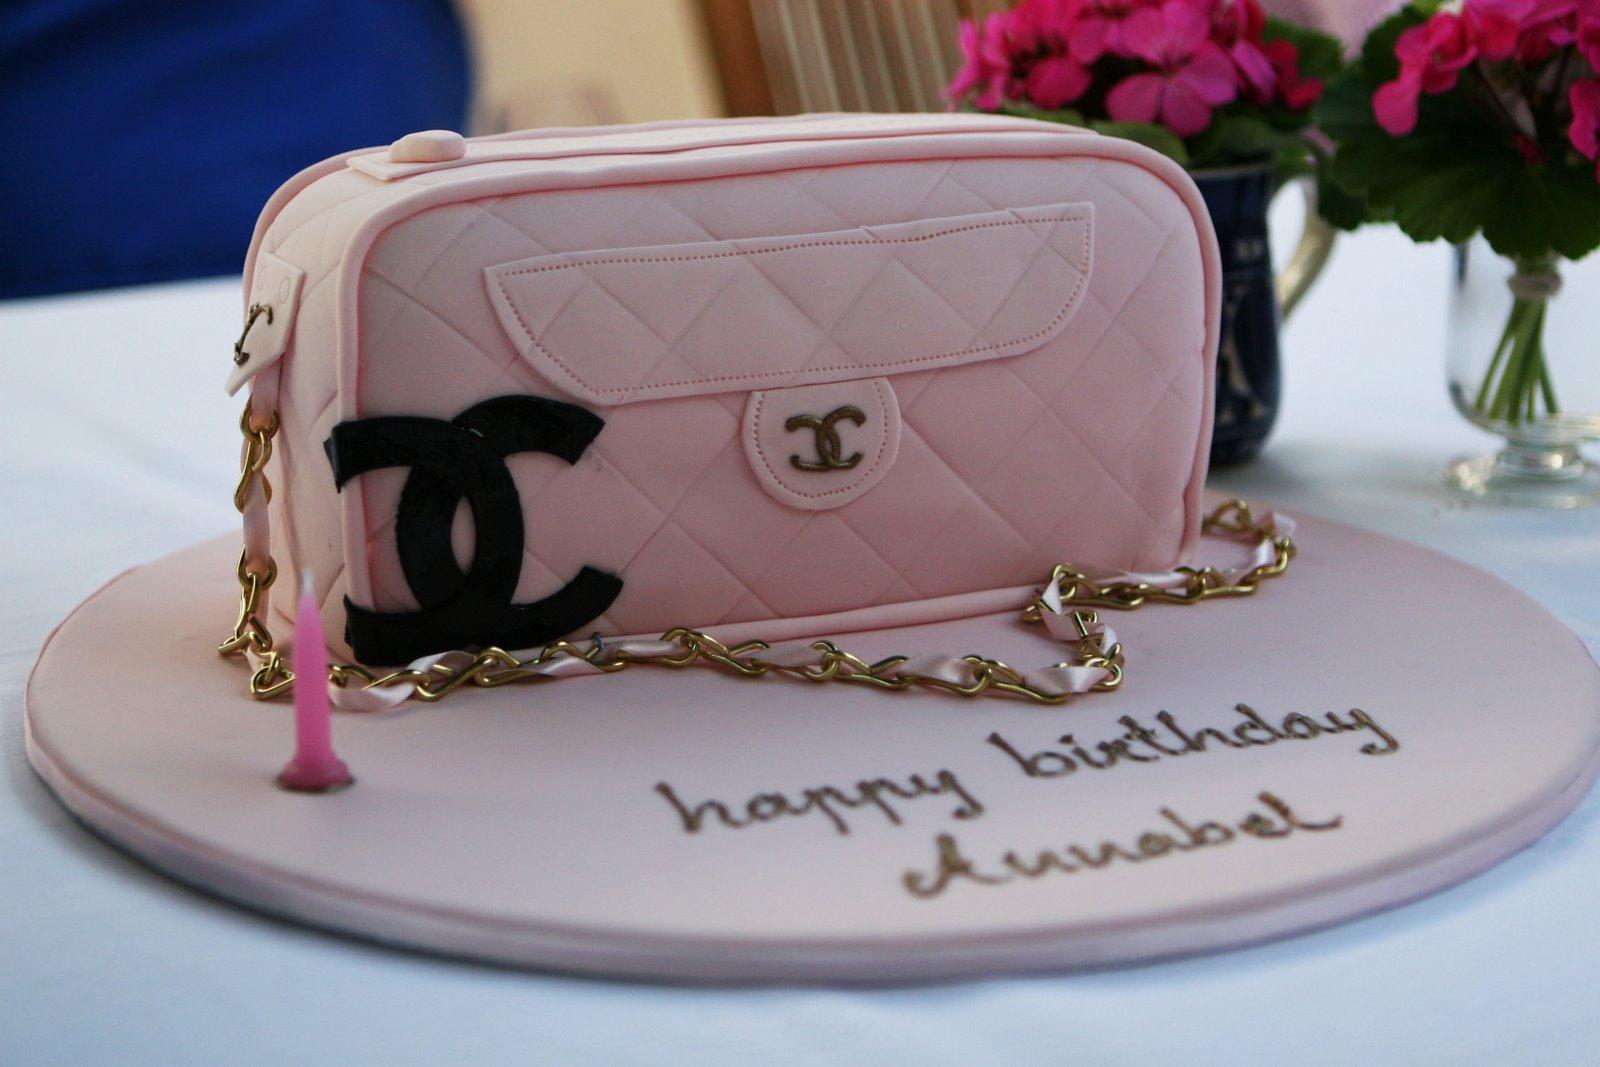 71ec0482282a coco chanel handbag cake Source · Coco Chanel Purse Cake www topsimages com